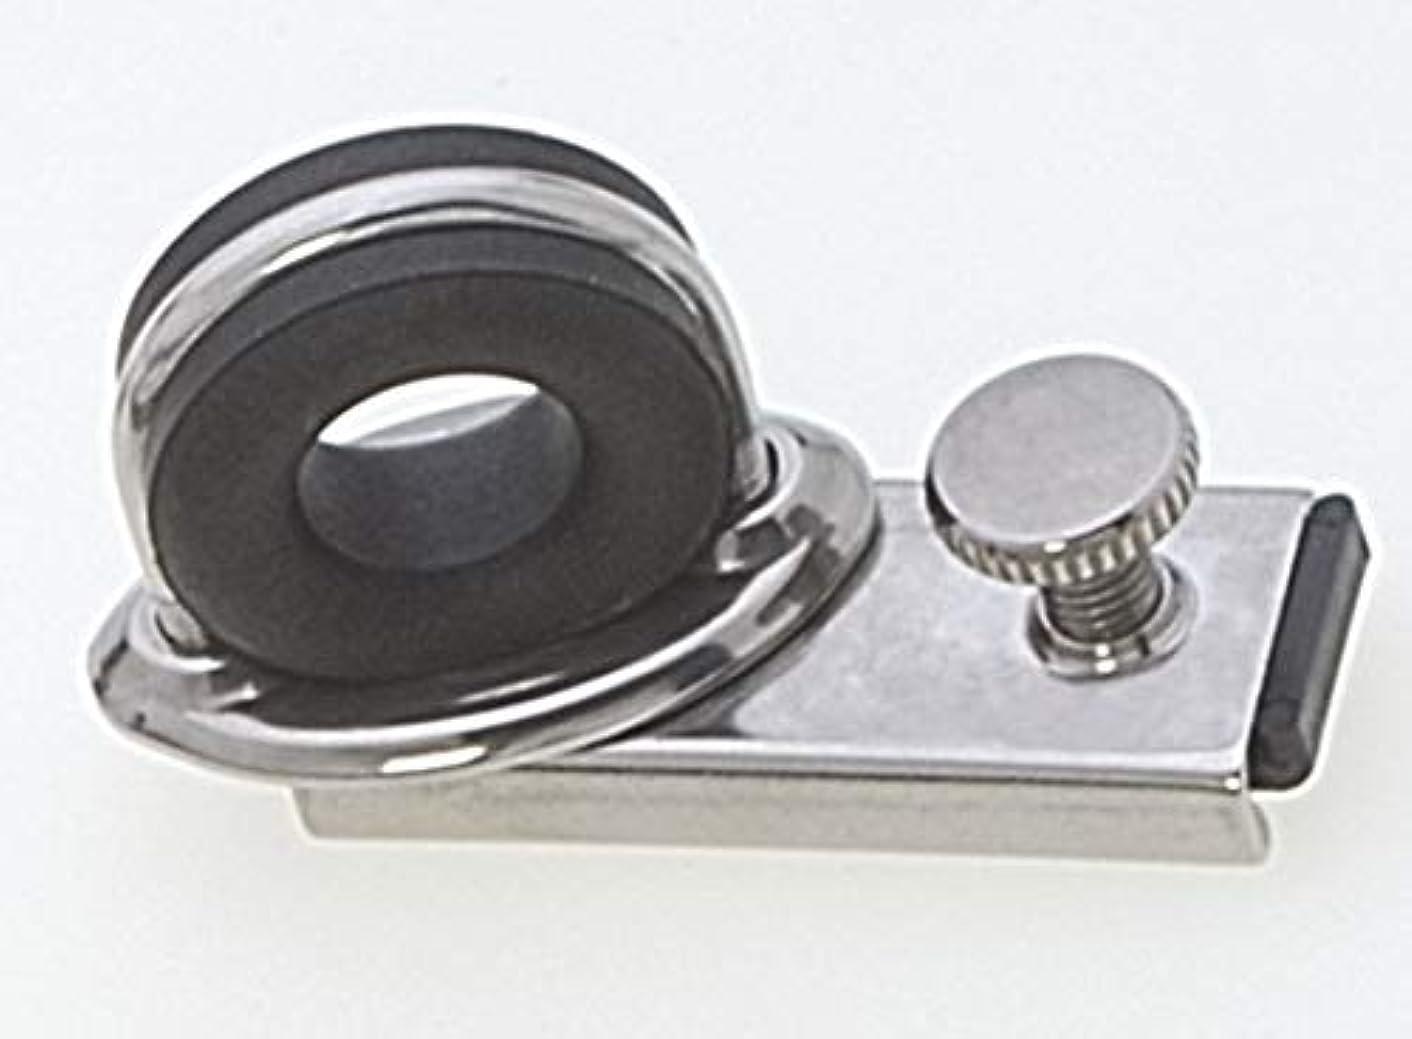 Viadana Aluminum T-Track & Accessories - Various Sizes & Styles (22mm, Swivel Bullseye)